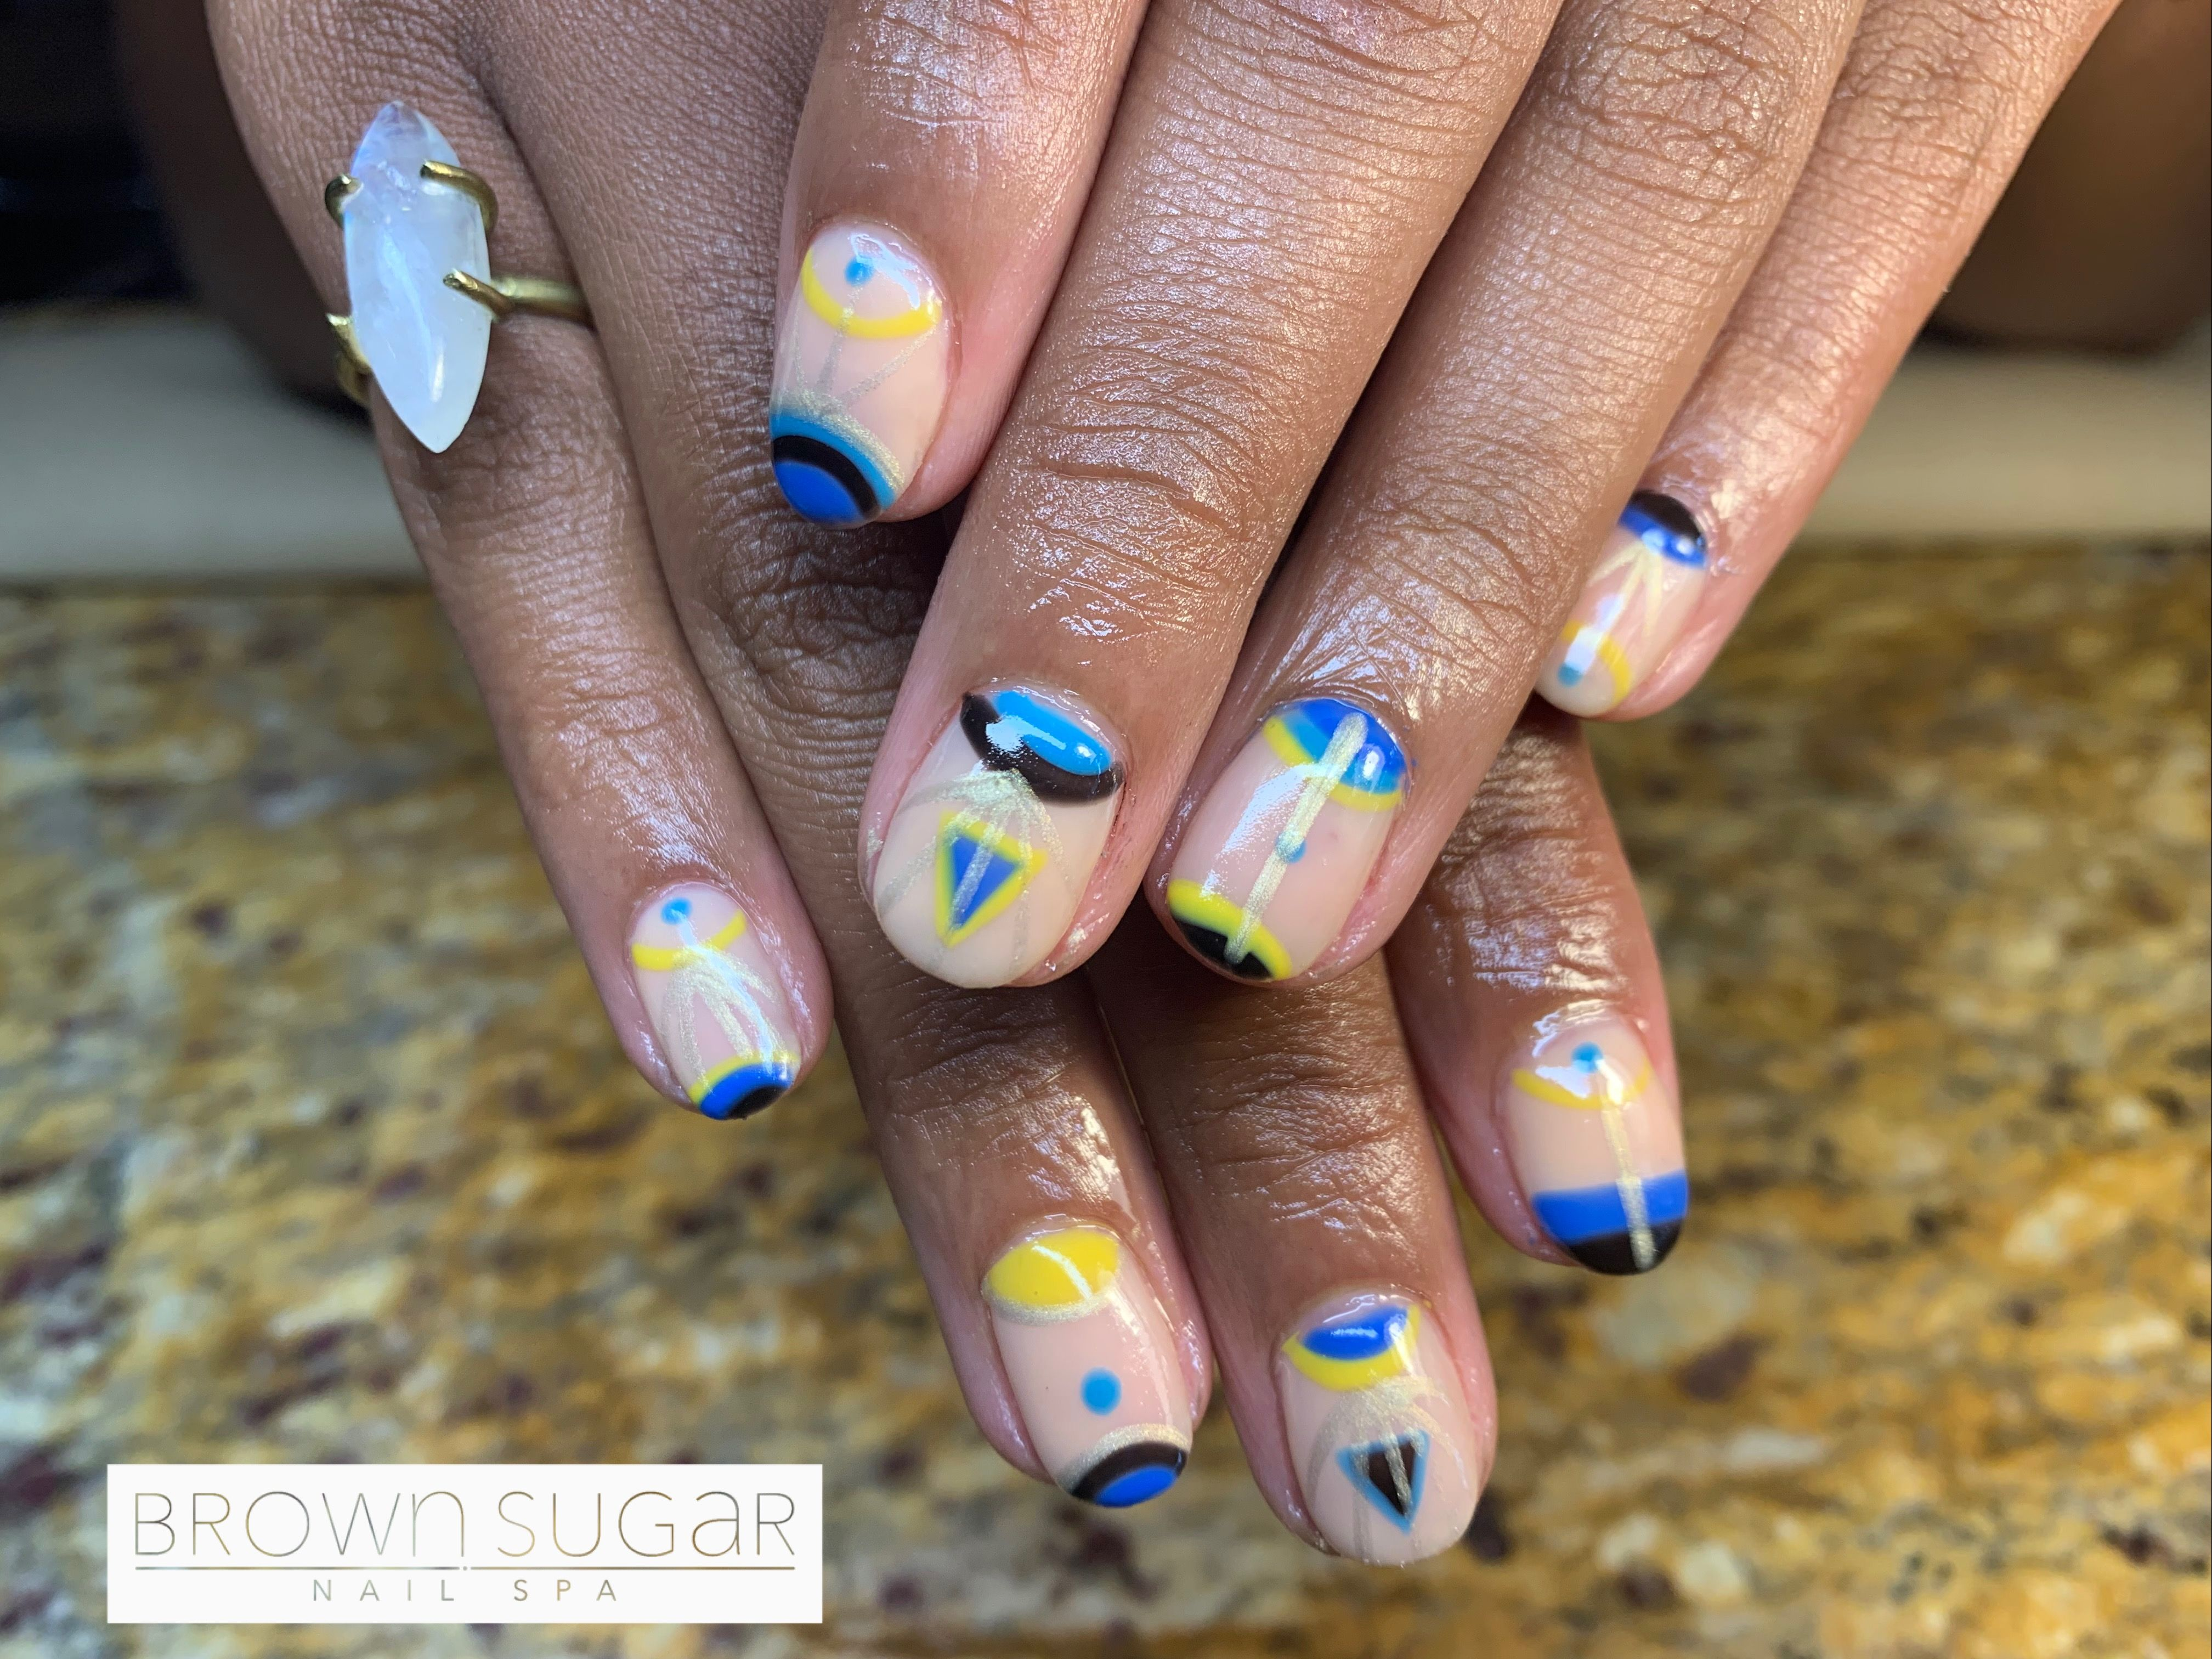 #nails #naturalnails #manicure #gelmanicure #gelnails #gelpolish #opi #opinails #naildesigns #tribal #tribalart #nailart #nailartaddict #brownsugarnailspa